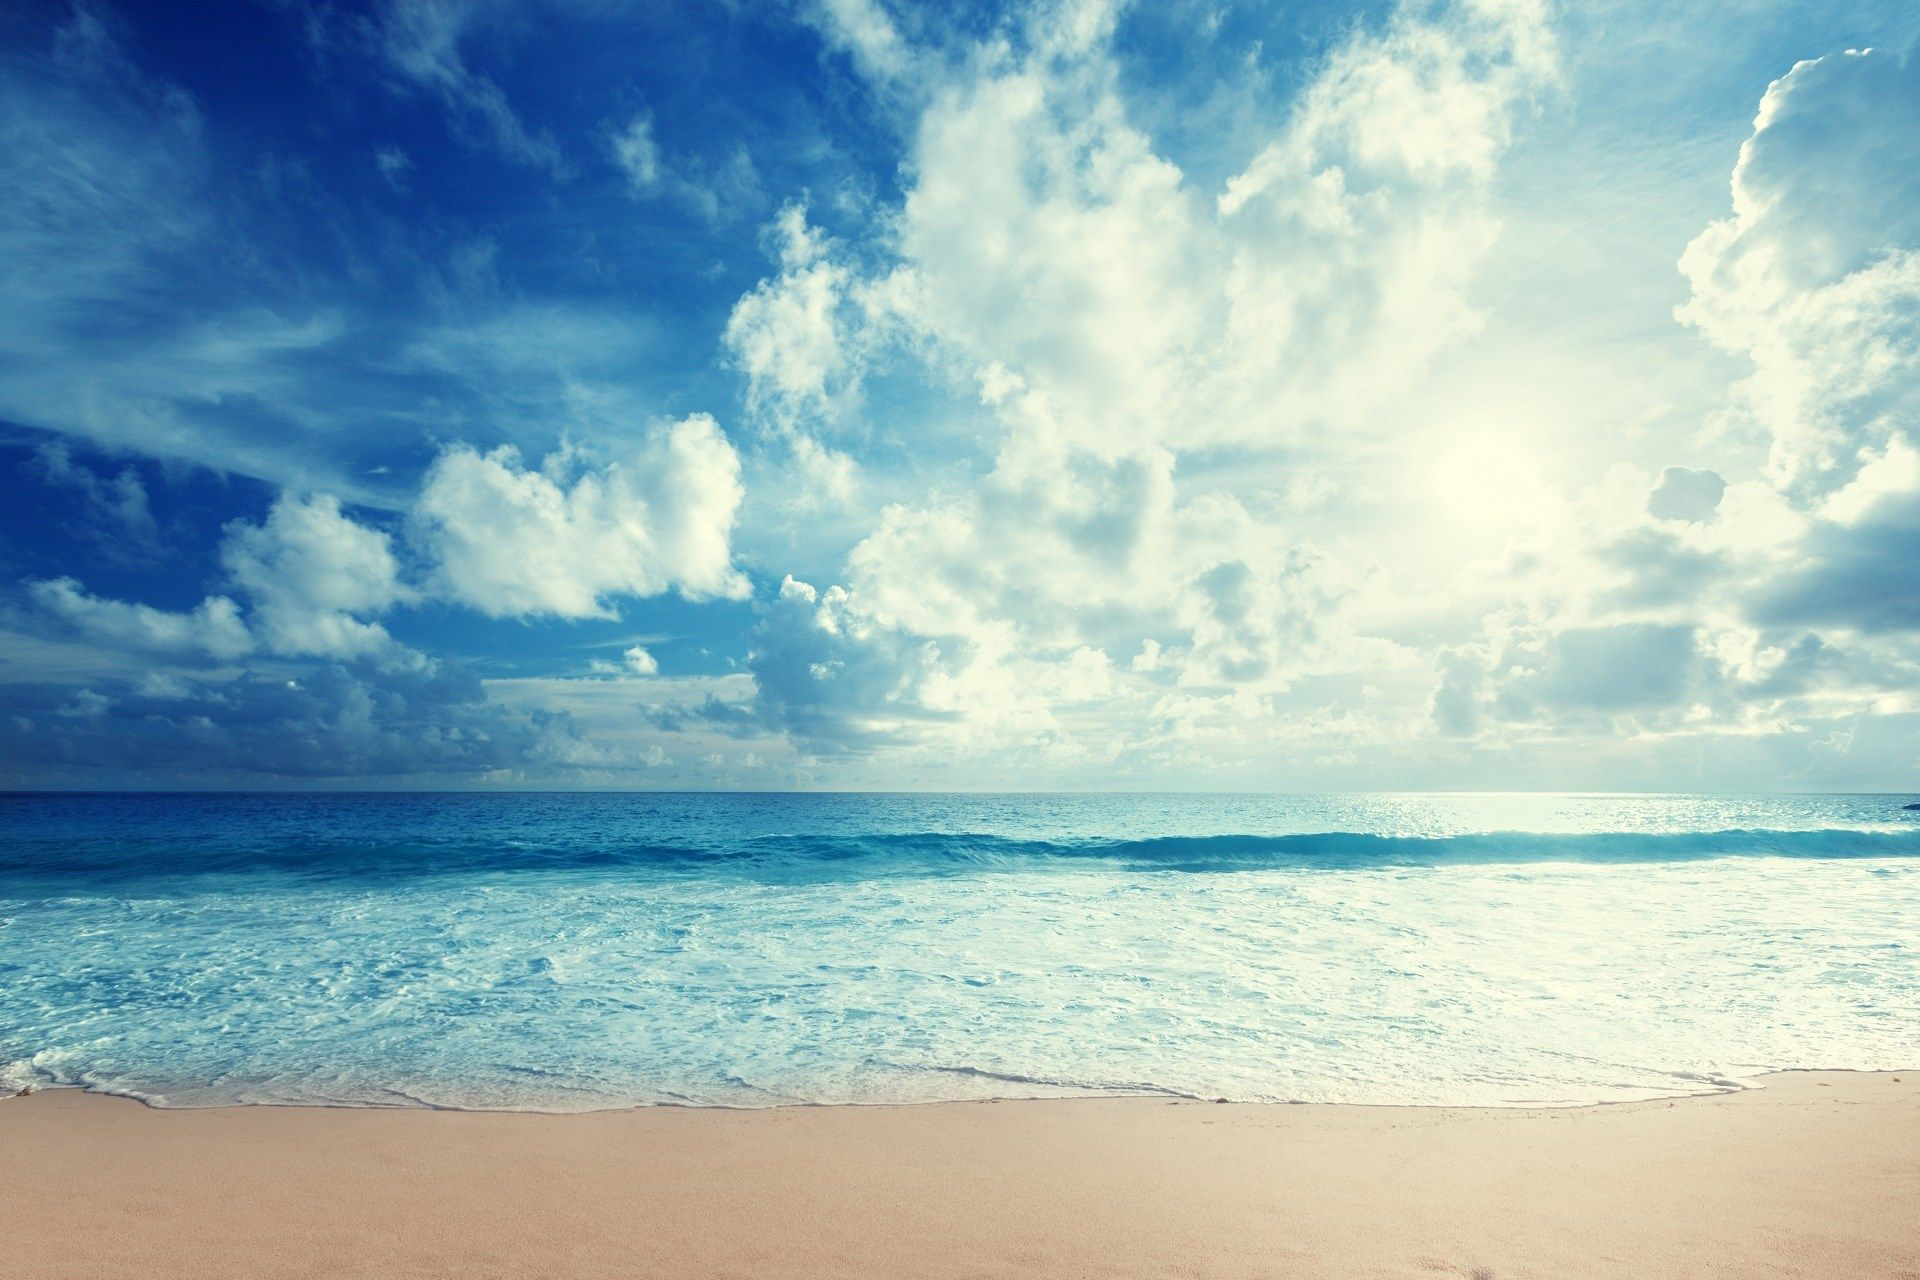 Free Screensaver Wallpapers For Beach Beach Screensaver Beach Wallpaper Beach Tumblr